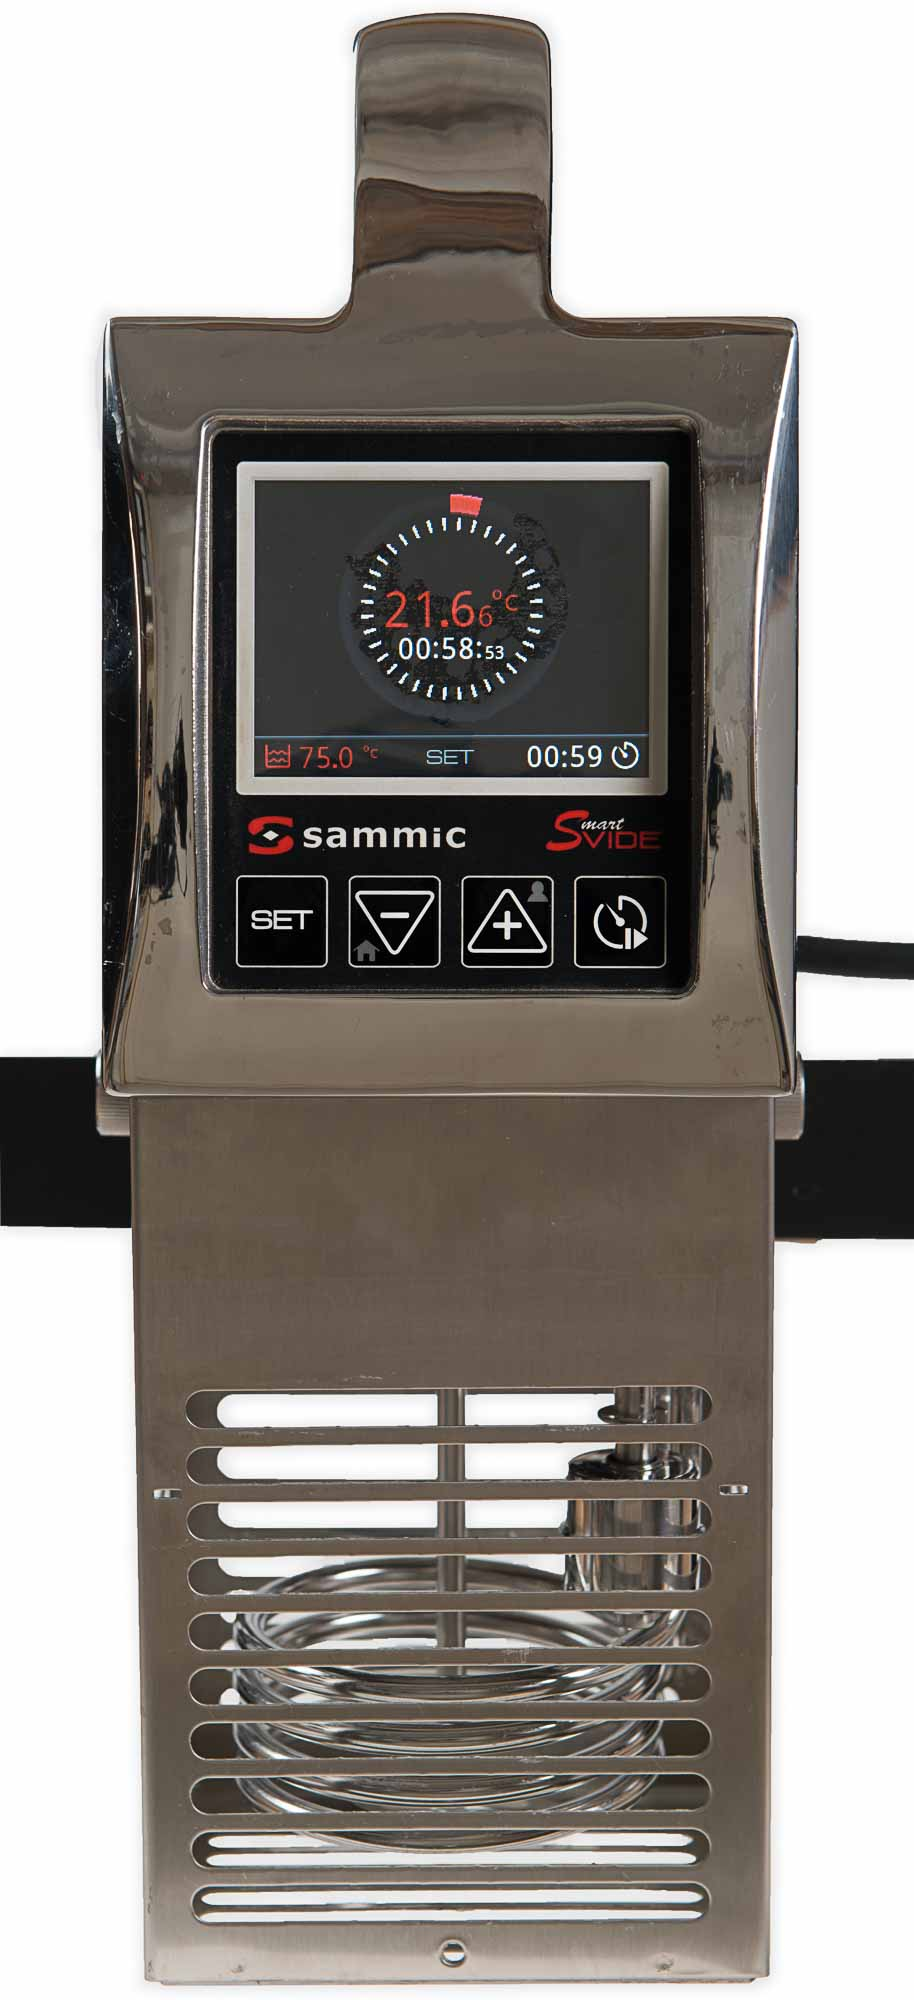 sammic_smartvide8plus_01